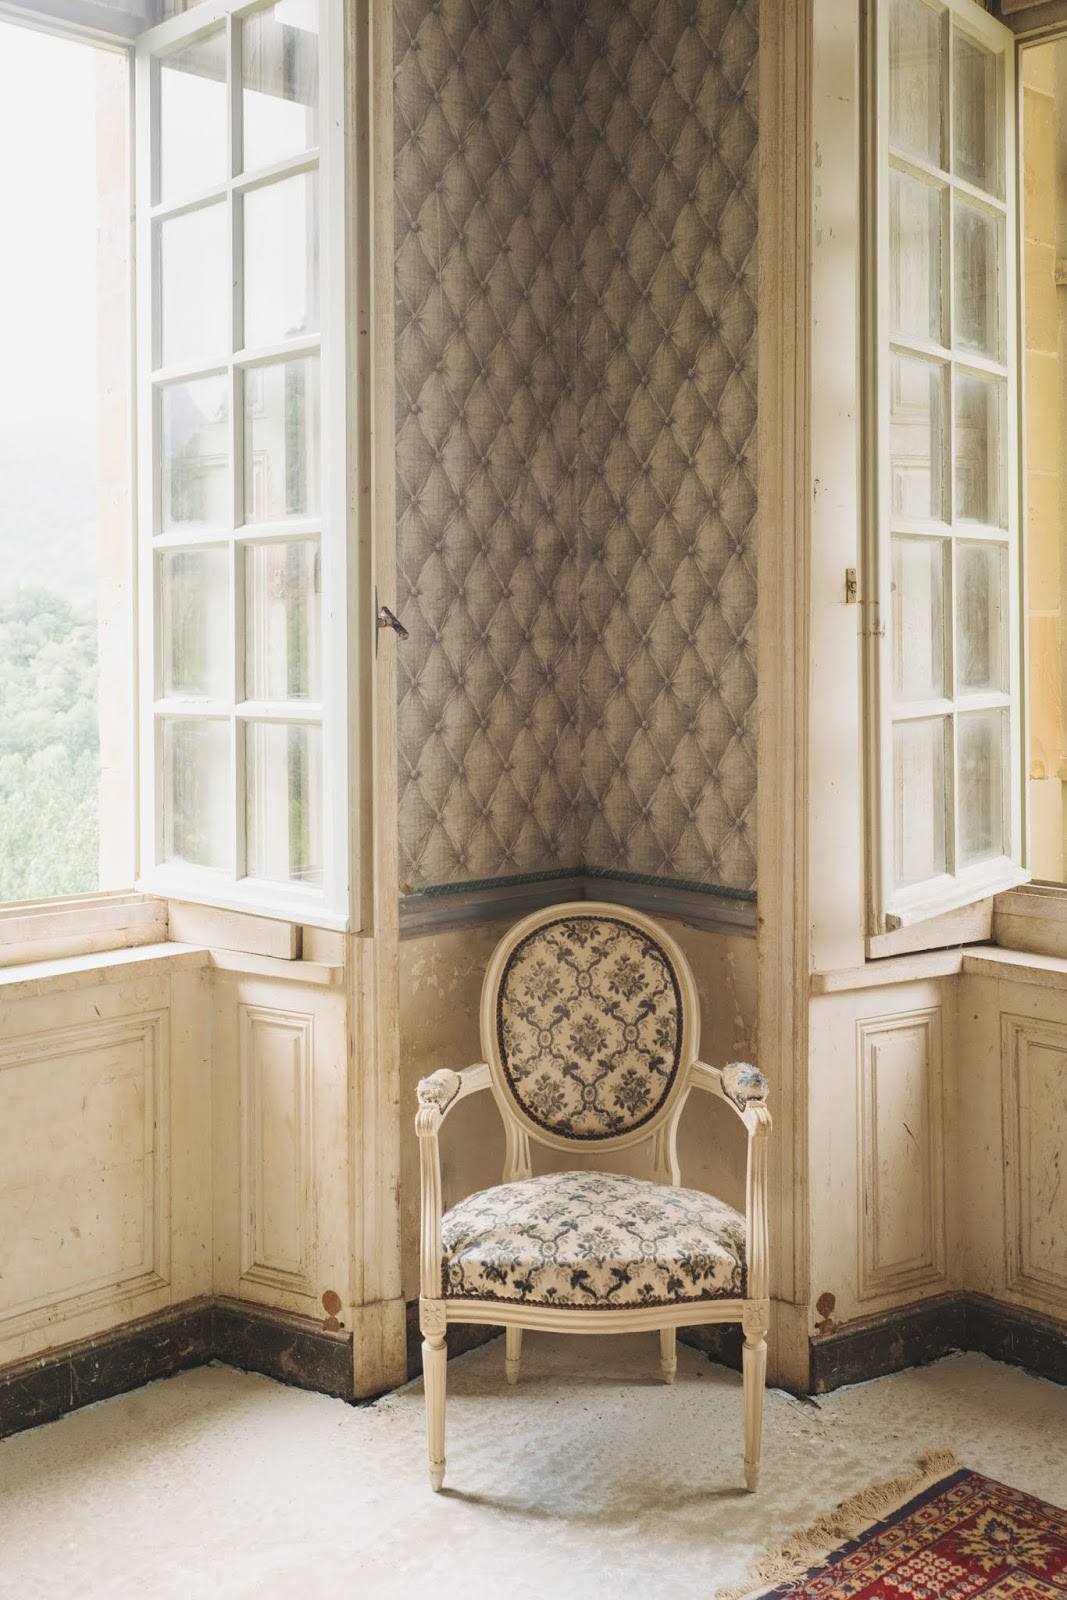 Chateau_de_Gudanes_084.jpg